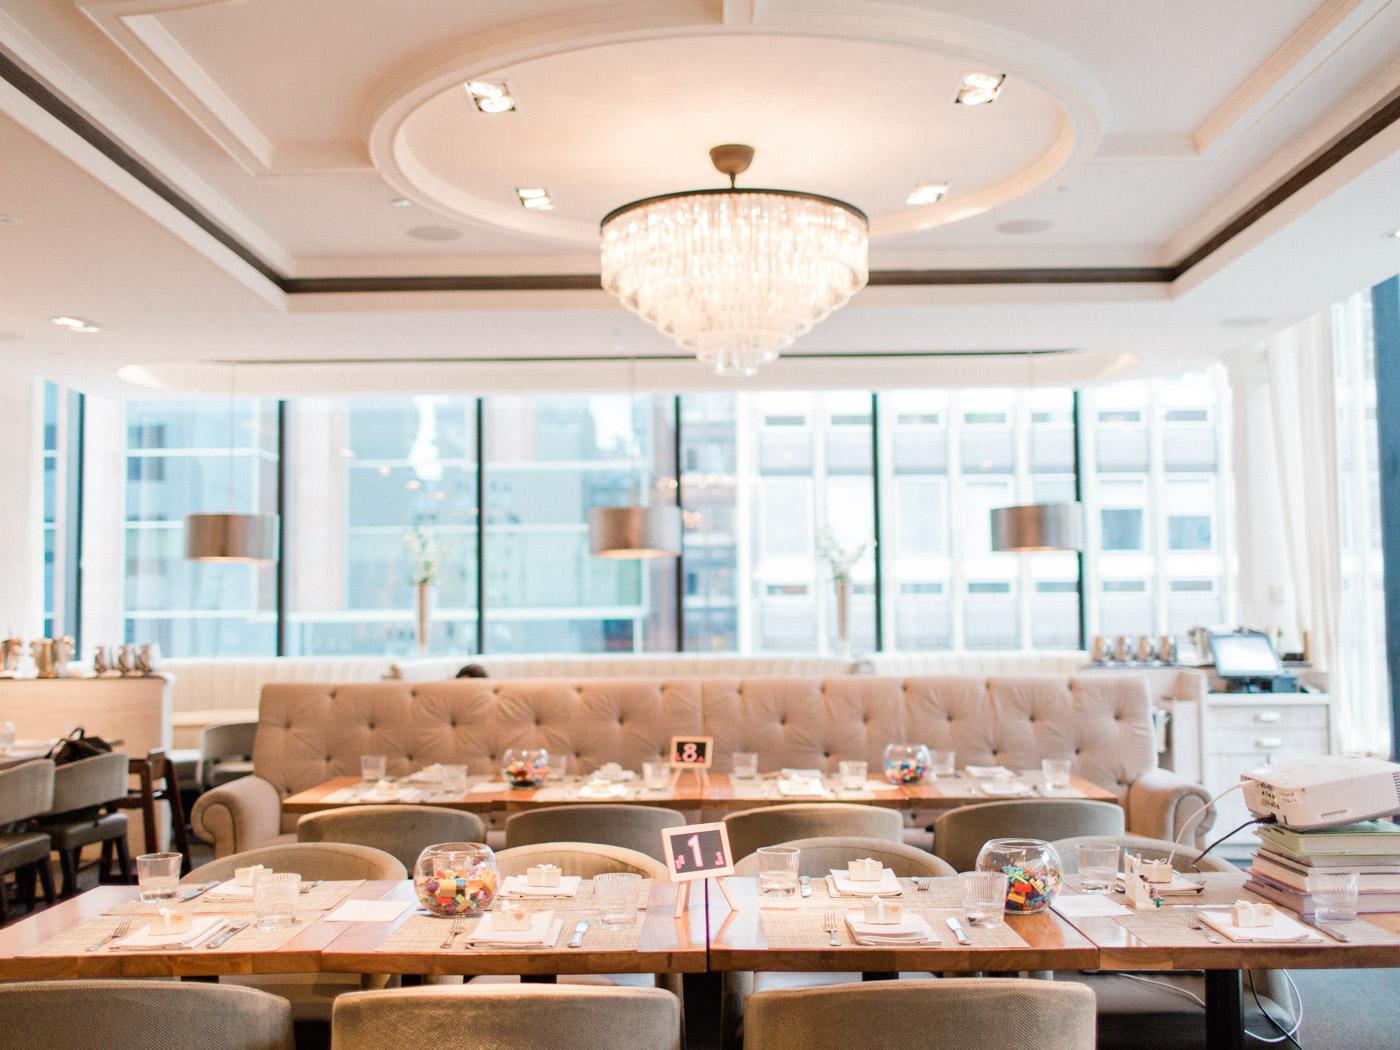 Toronto-wedding-photographer-intimate-restaurant-elopement-chase-oyster-downtown43.jpg